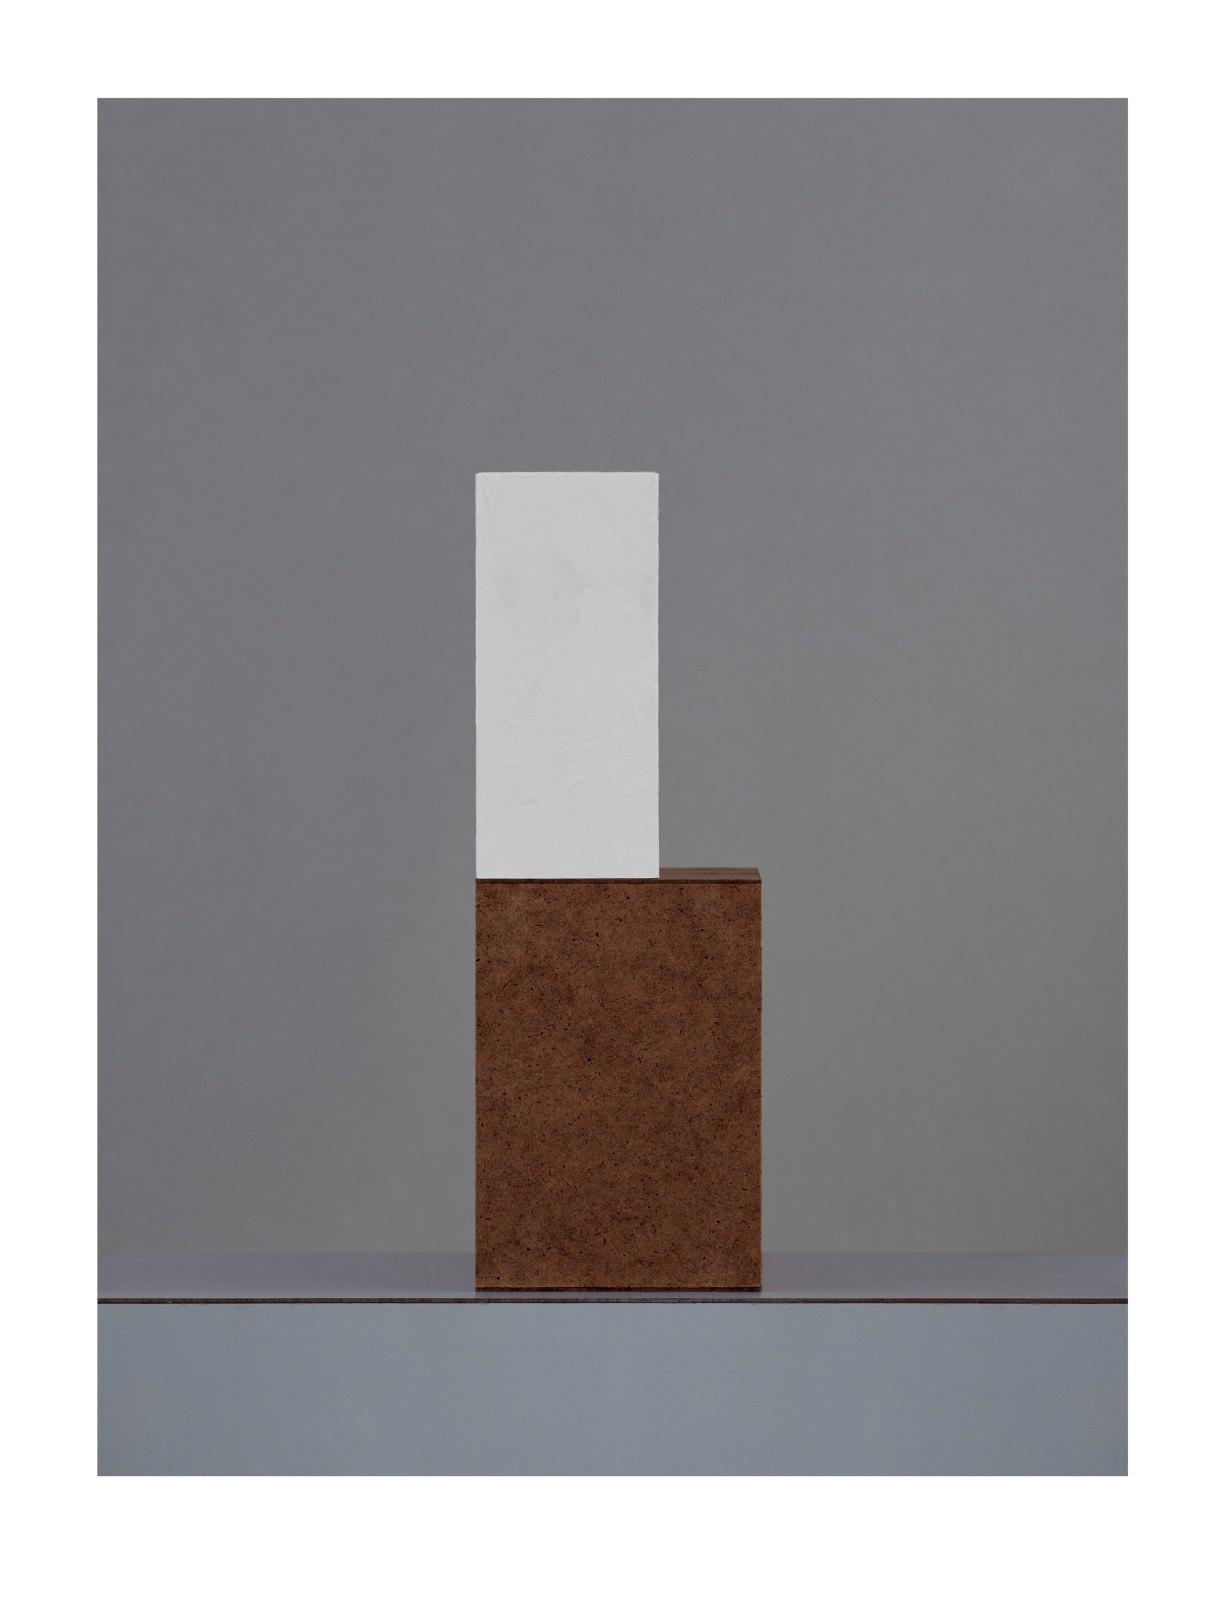 Austiére I, 2012, giclée print on Wandflies on aluminium, 83 x 63 cm